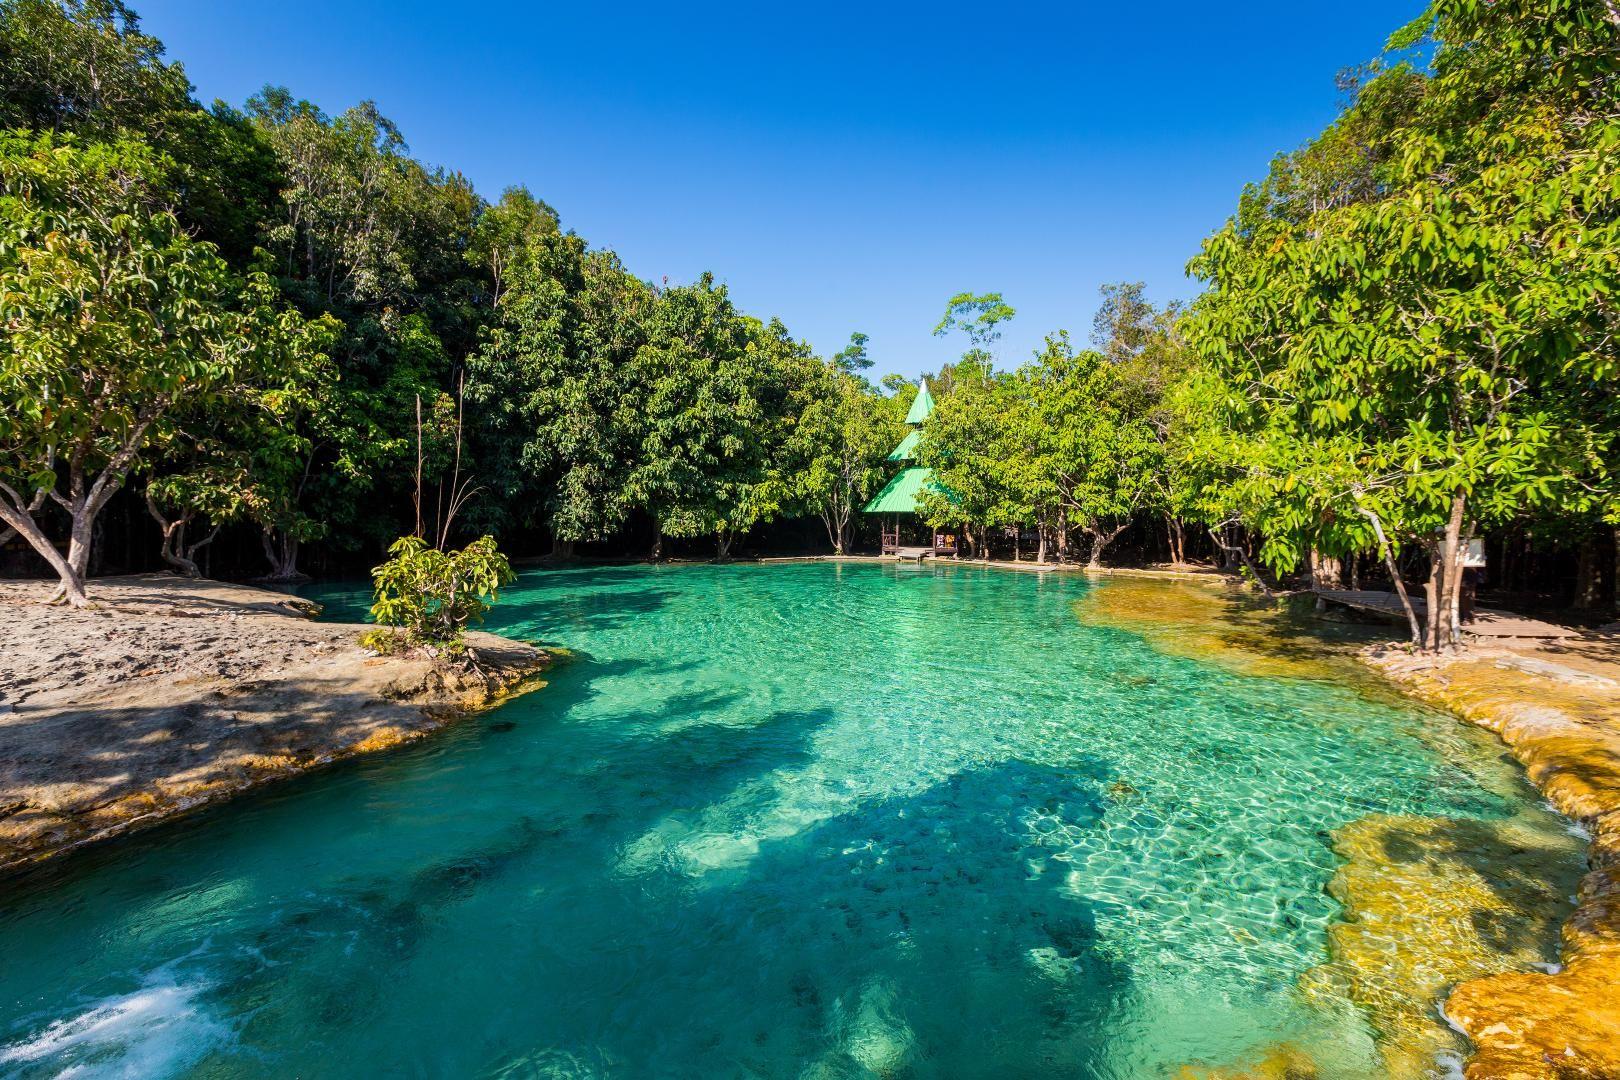 The Emerald Pool